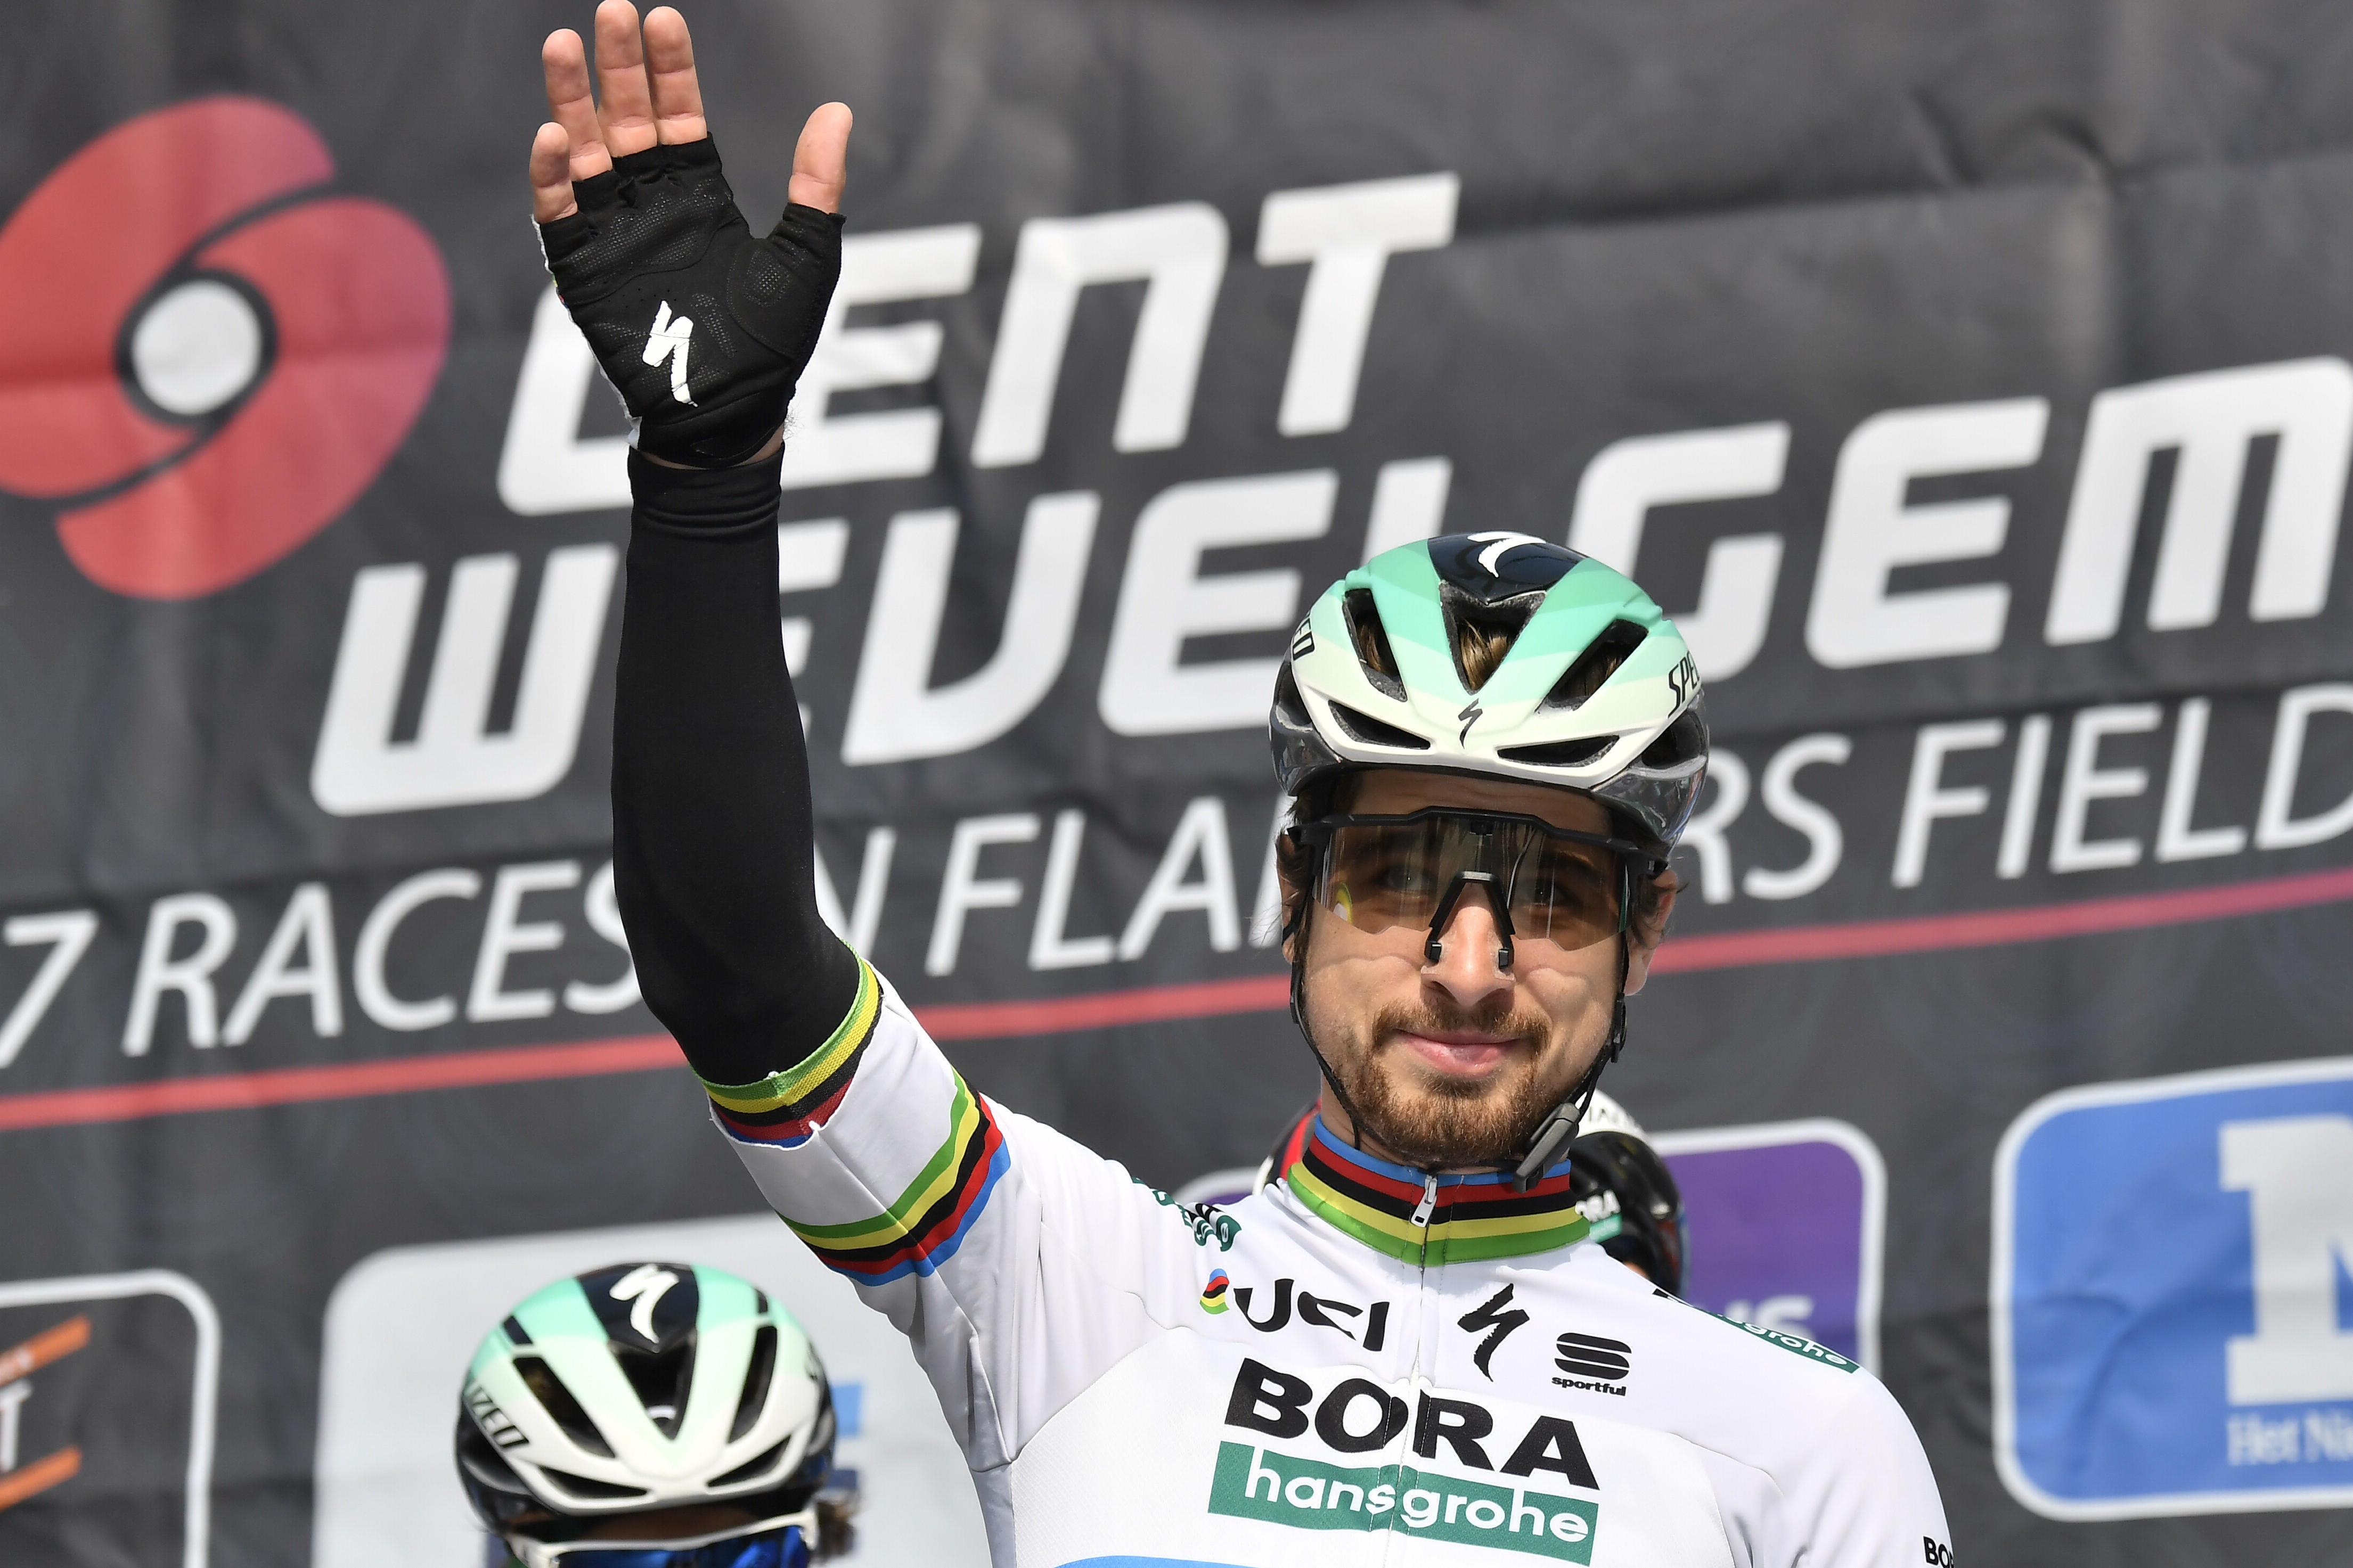 Gand-Wevelgem: trionfo di Sagan, secondo l'azzurro Viviani